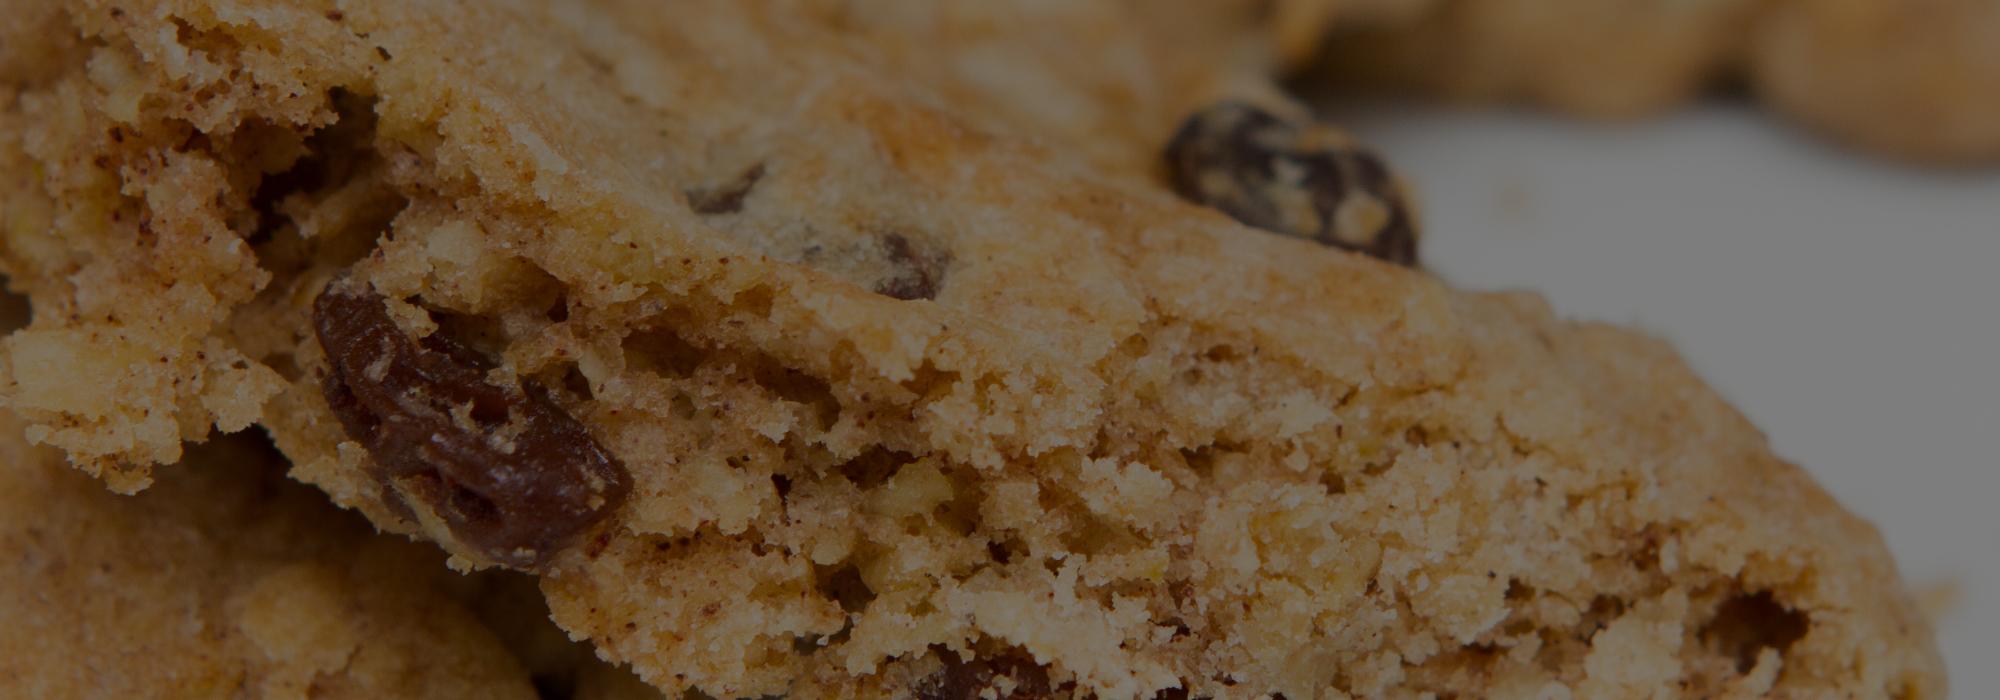 Cricket Powder Oatmeal-Raisin Cookies Recipe